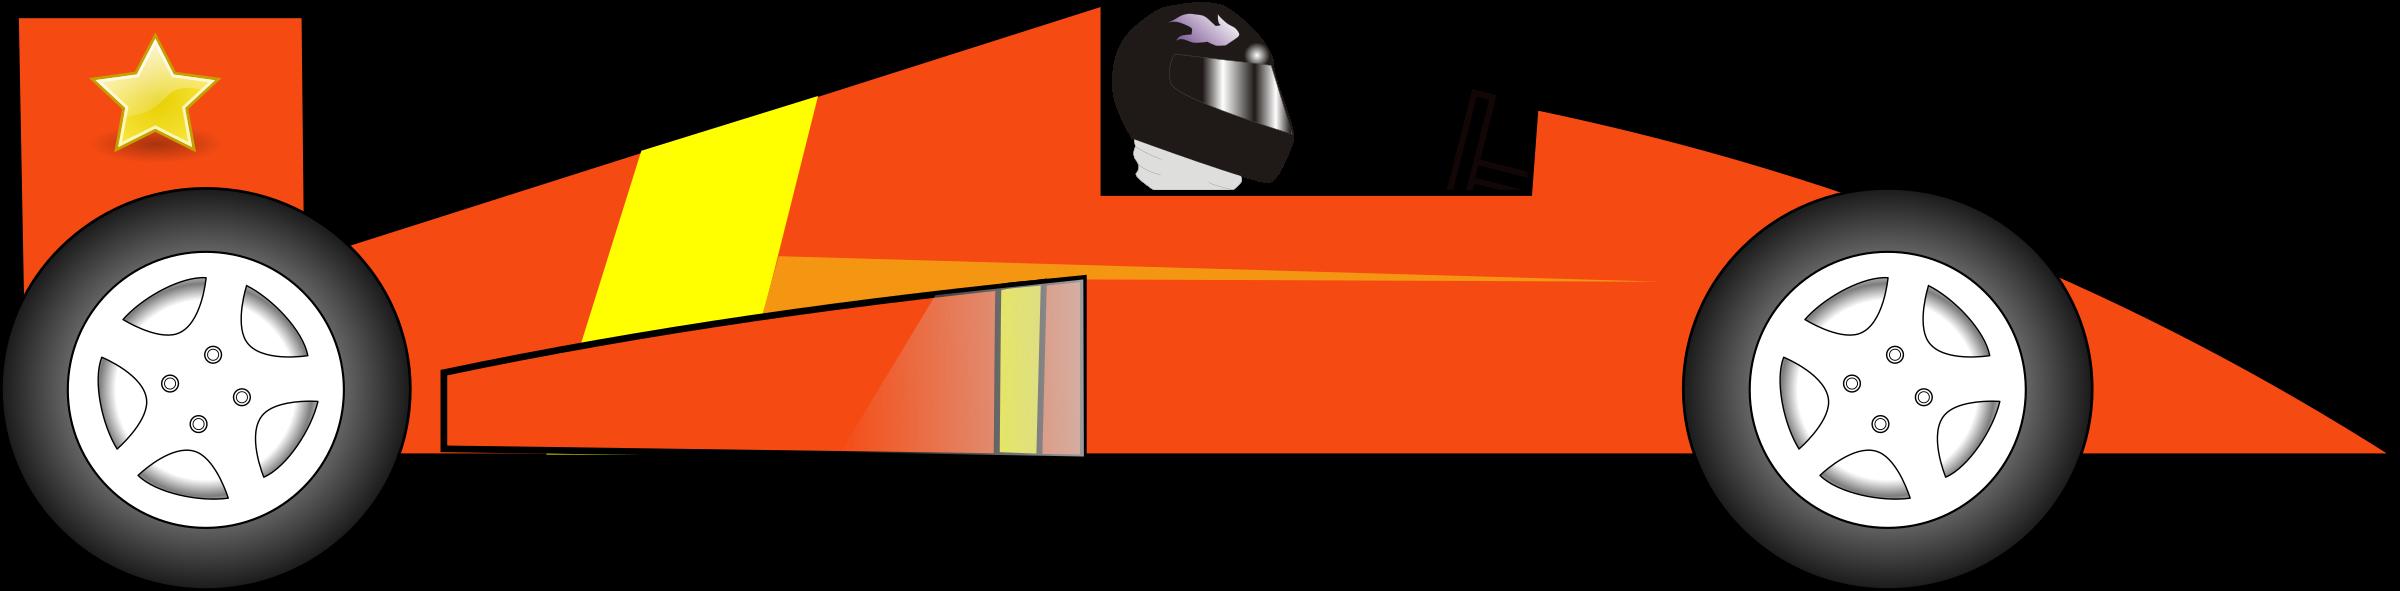 2817 Race Car free clipart.